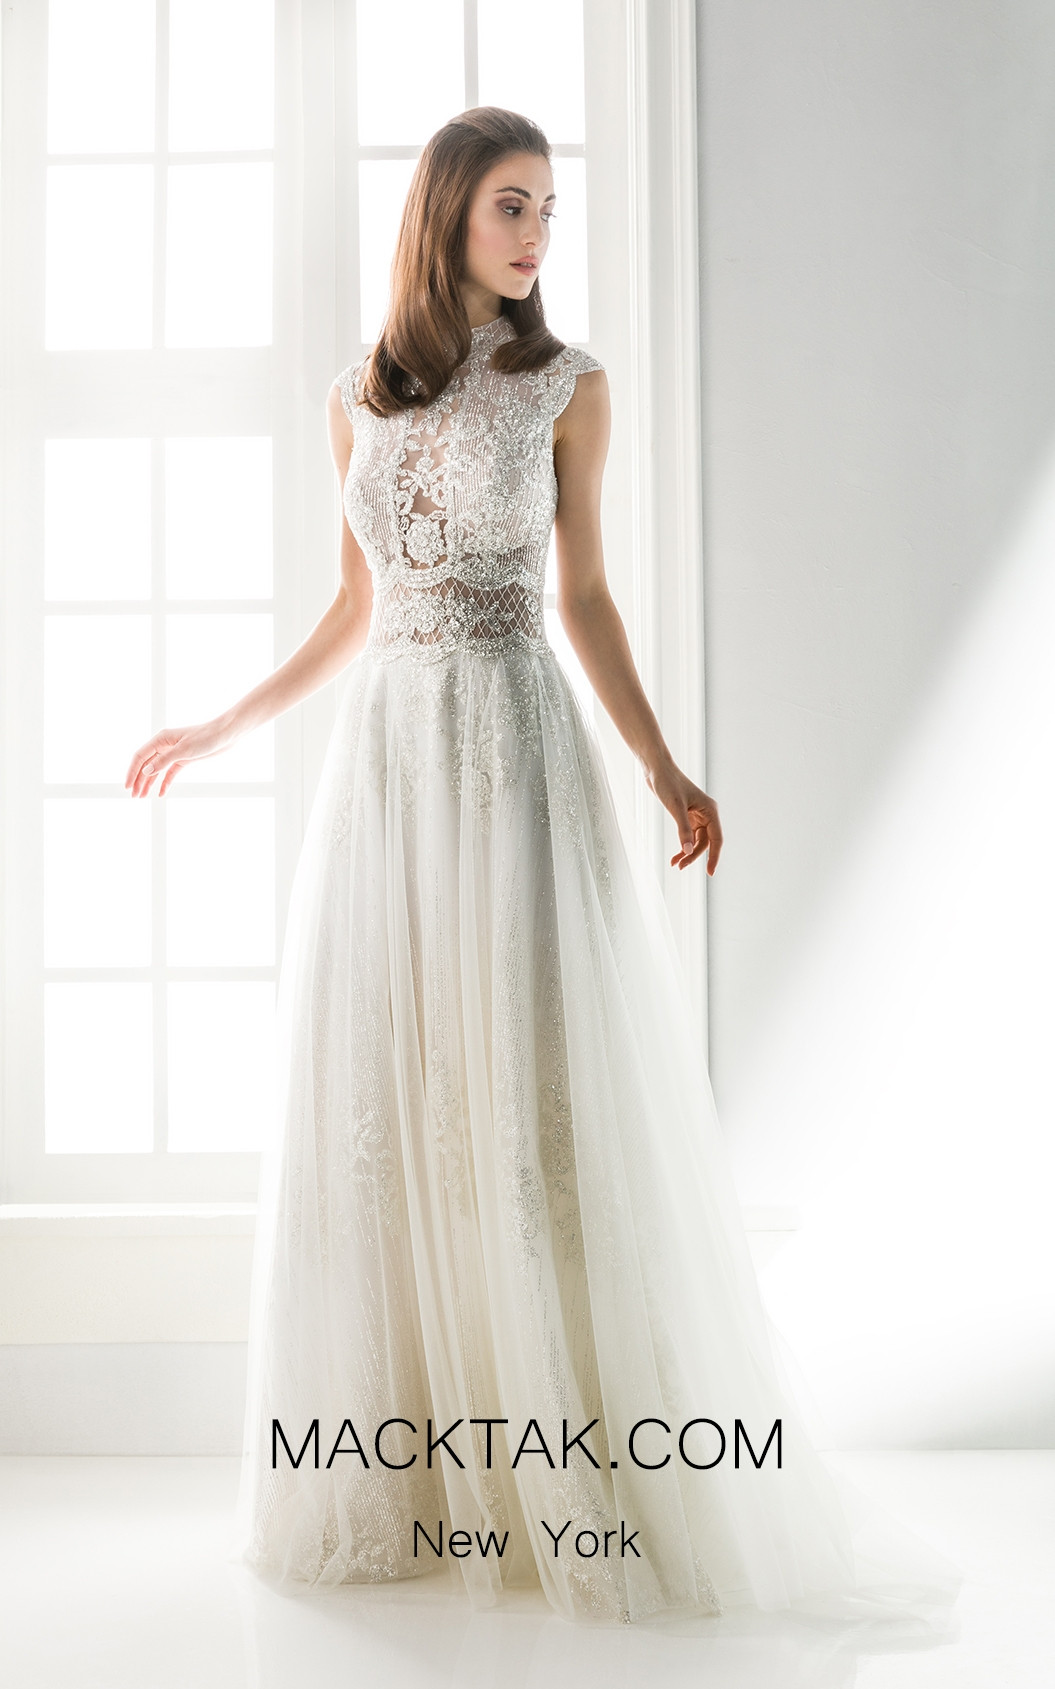 Jiouli Medusa 786 Ivory Front Wedding Dress